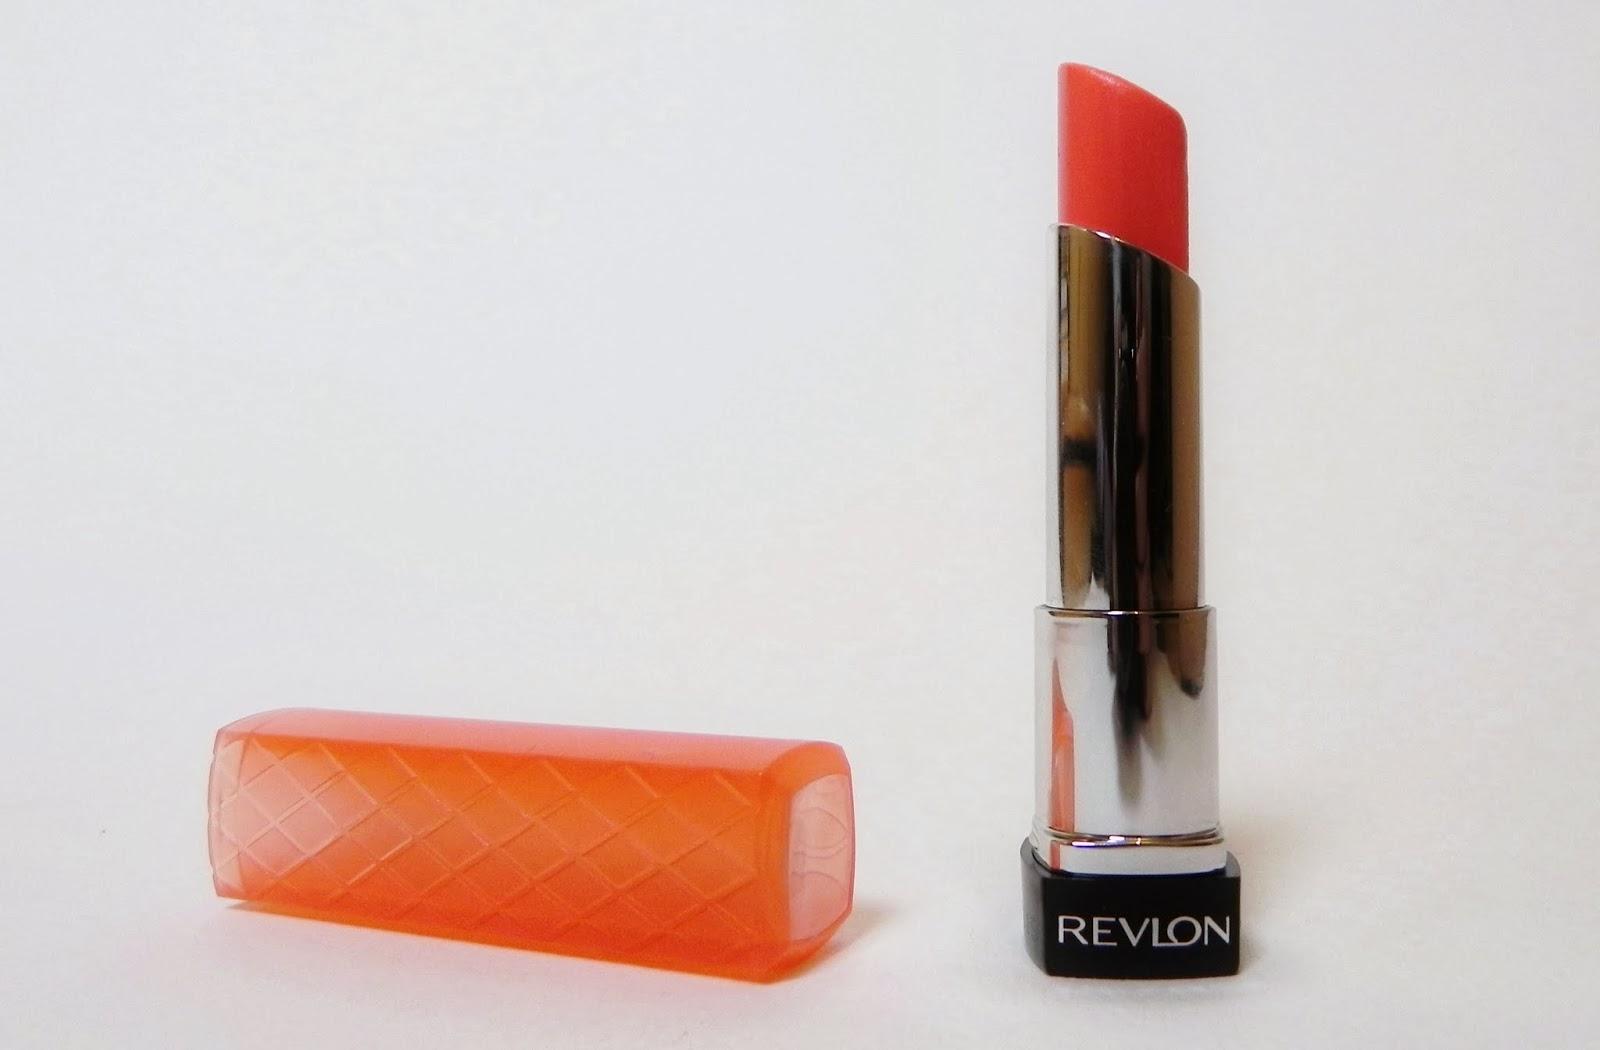 Revlon 'Juicy Papaya' Lip Butter Review